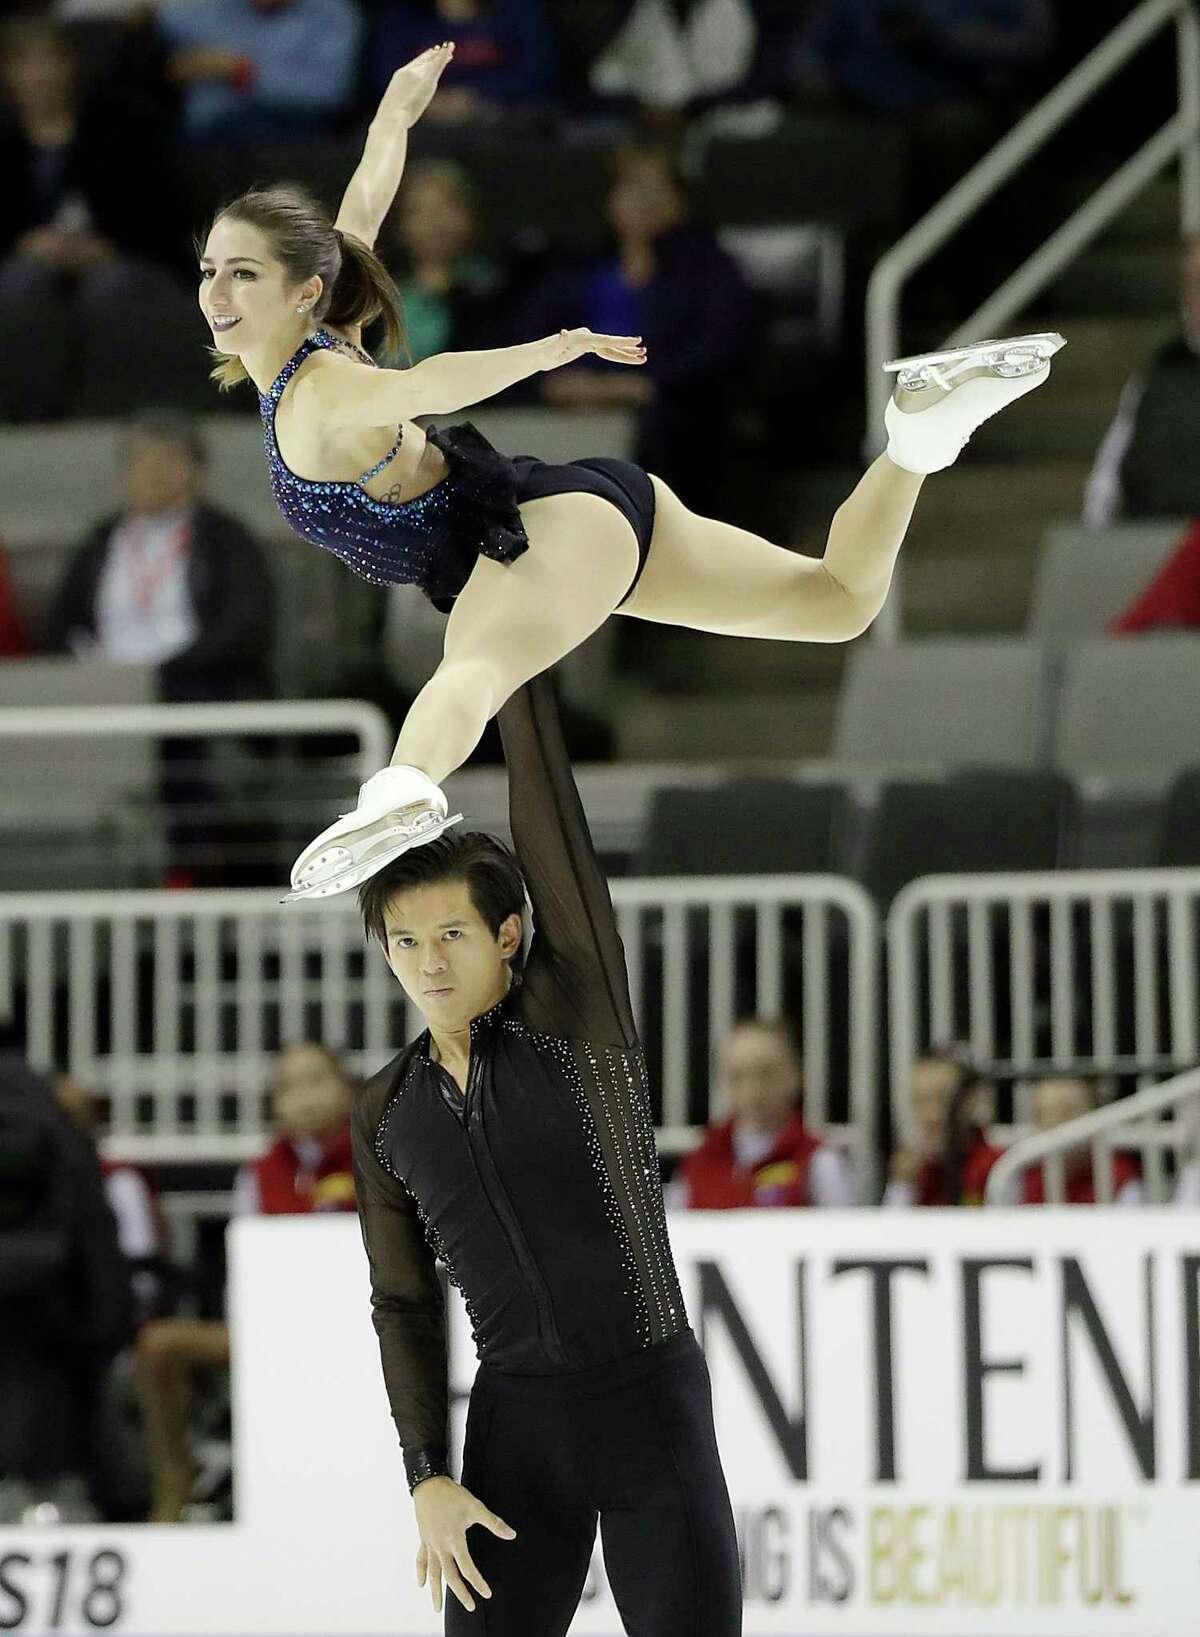 Marissa Castelli, top, and Mervin Tran perform during the pairs short program at the U.S. Figure Skating Championships in San Jose, Calif., Thursday, Jan. 4, 2018.